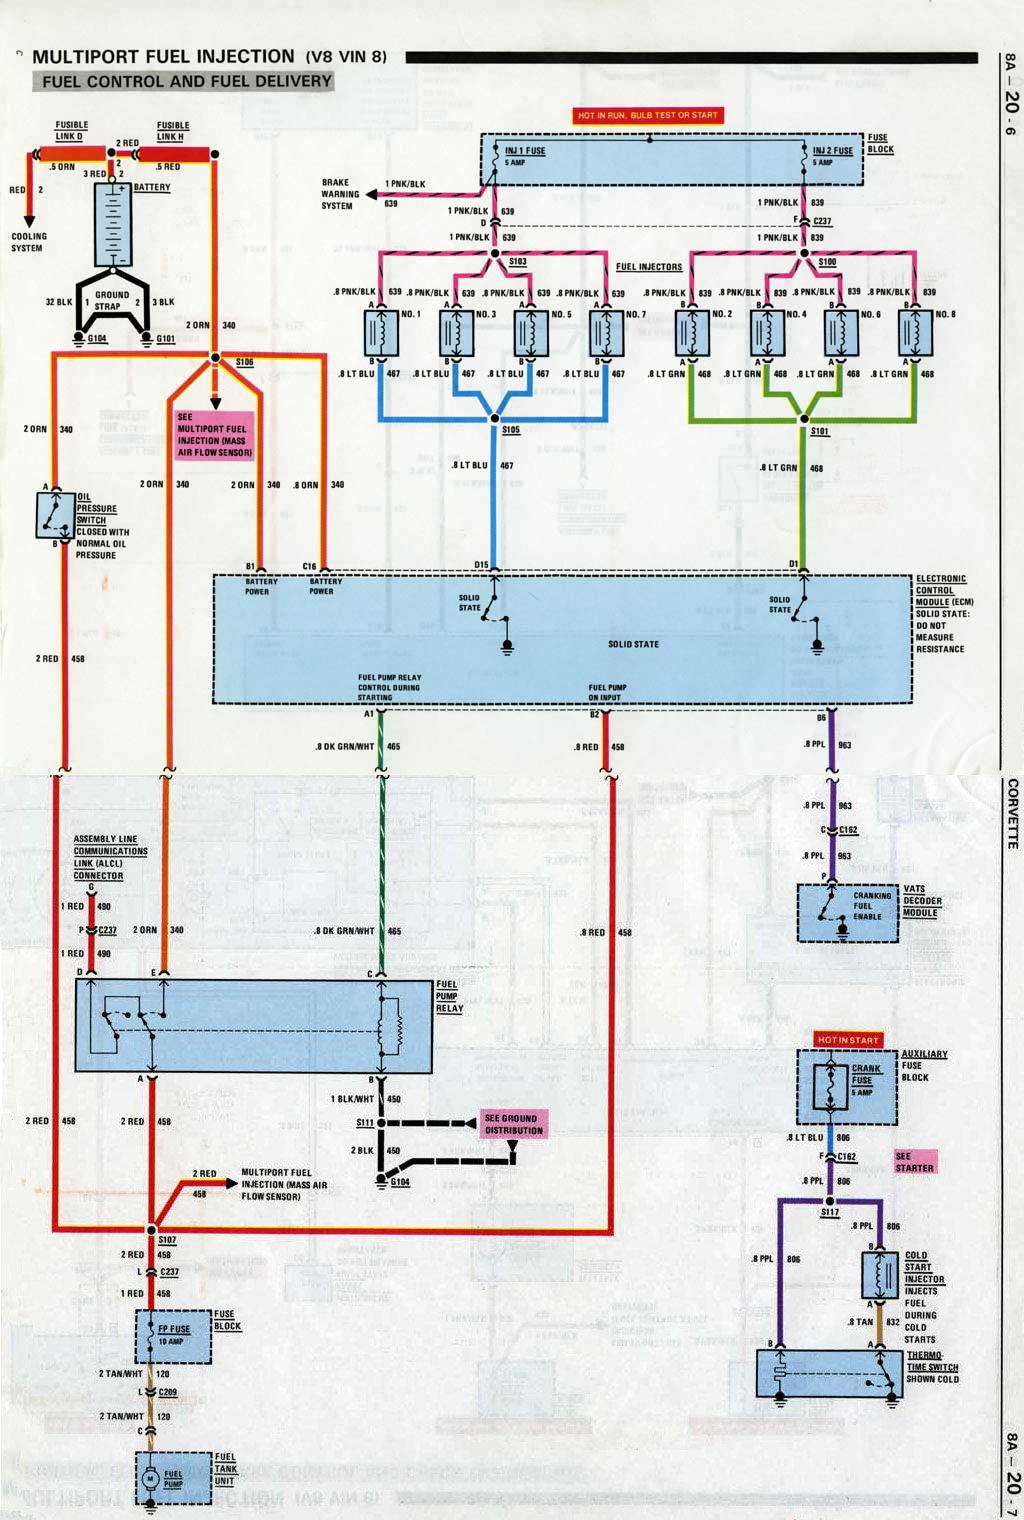 hight resolution of 94 corvette fuel pump wiring diagram wiring diagram split1984 corvette fuel pump wire harness wiring diagram